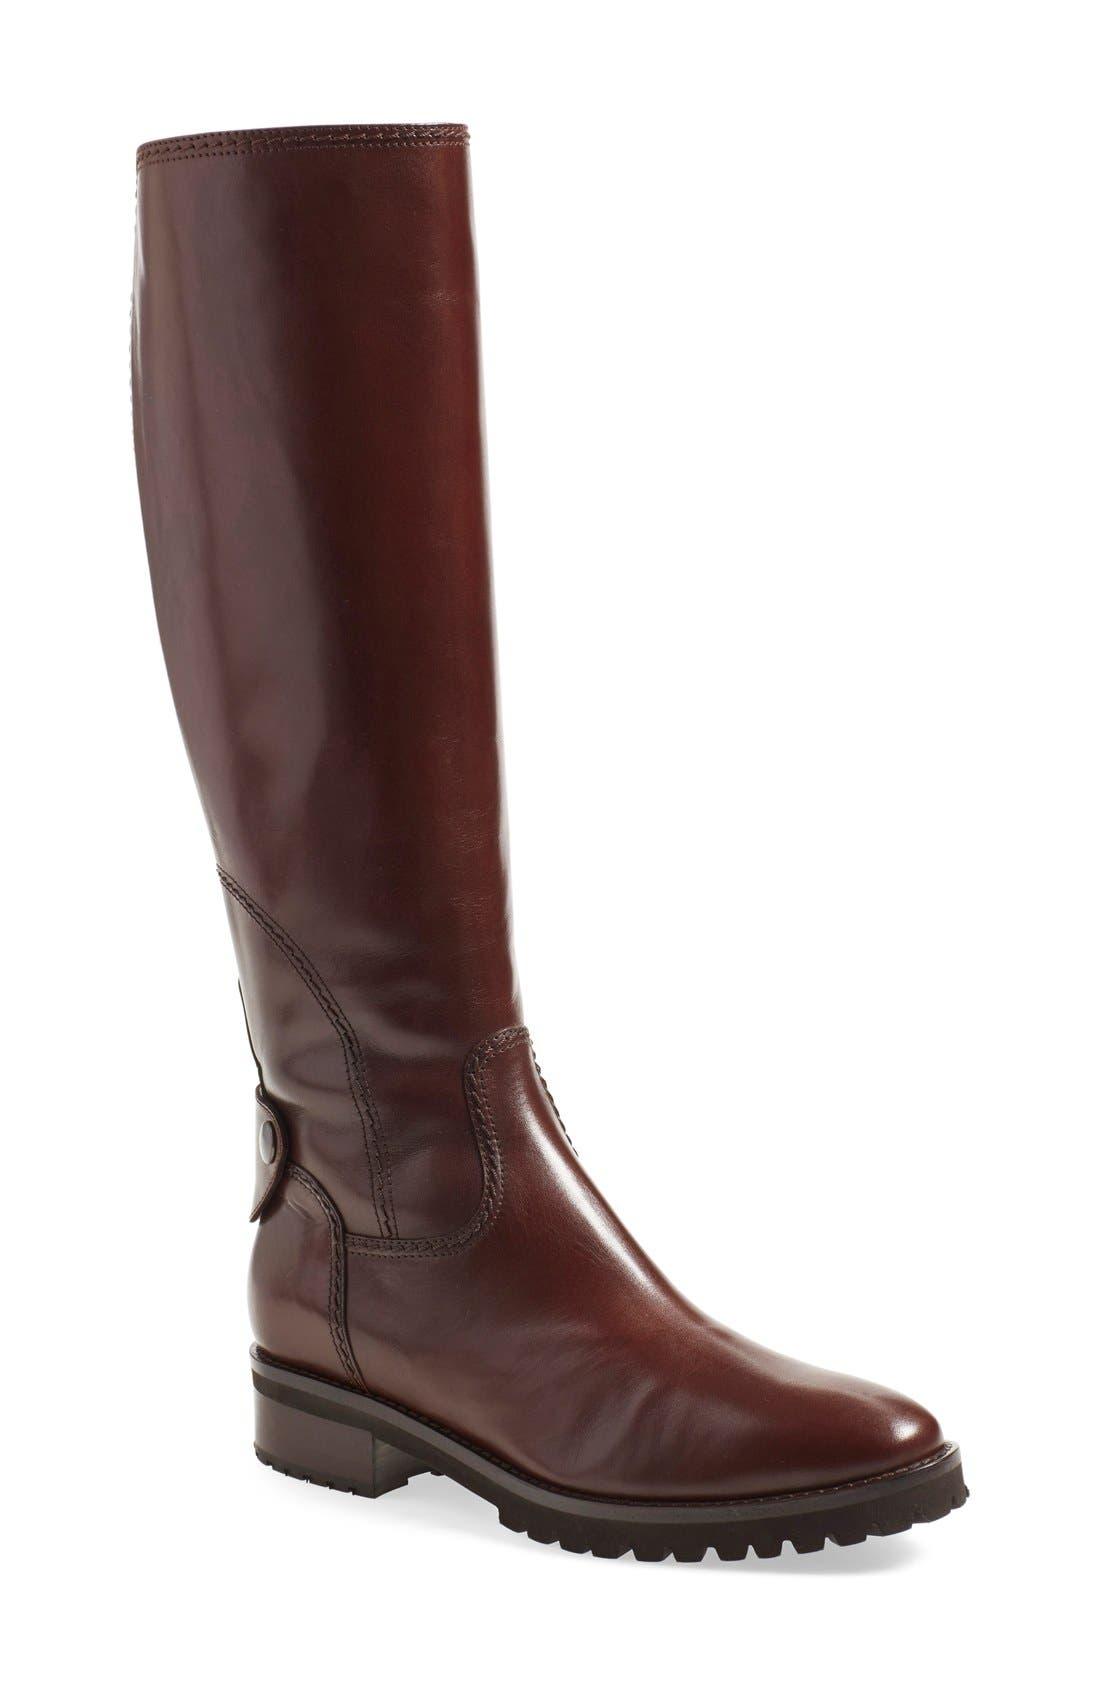 Alternate Image 1 Selected - AnyiLu 'Amber' Tall Boot (Women)